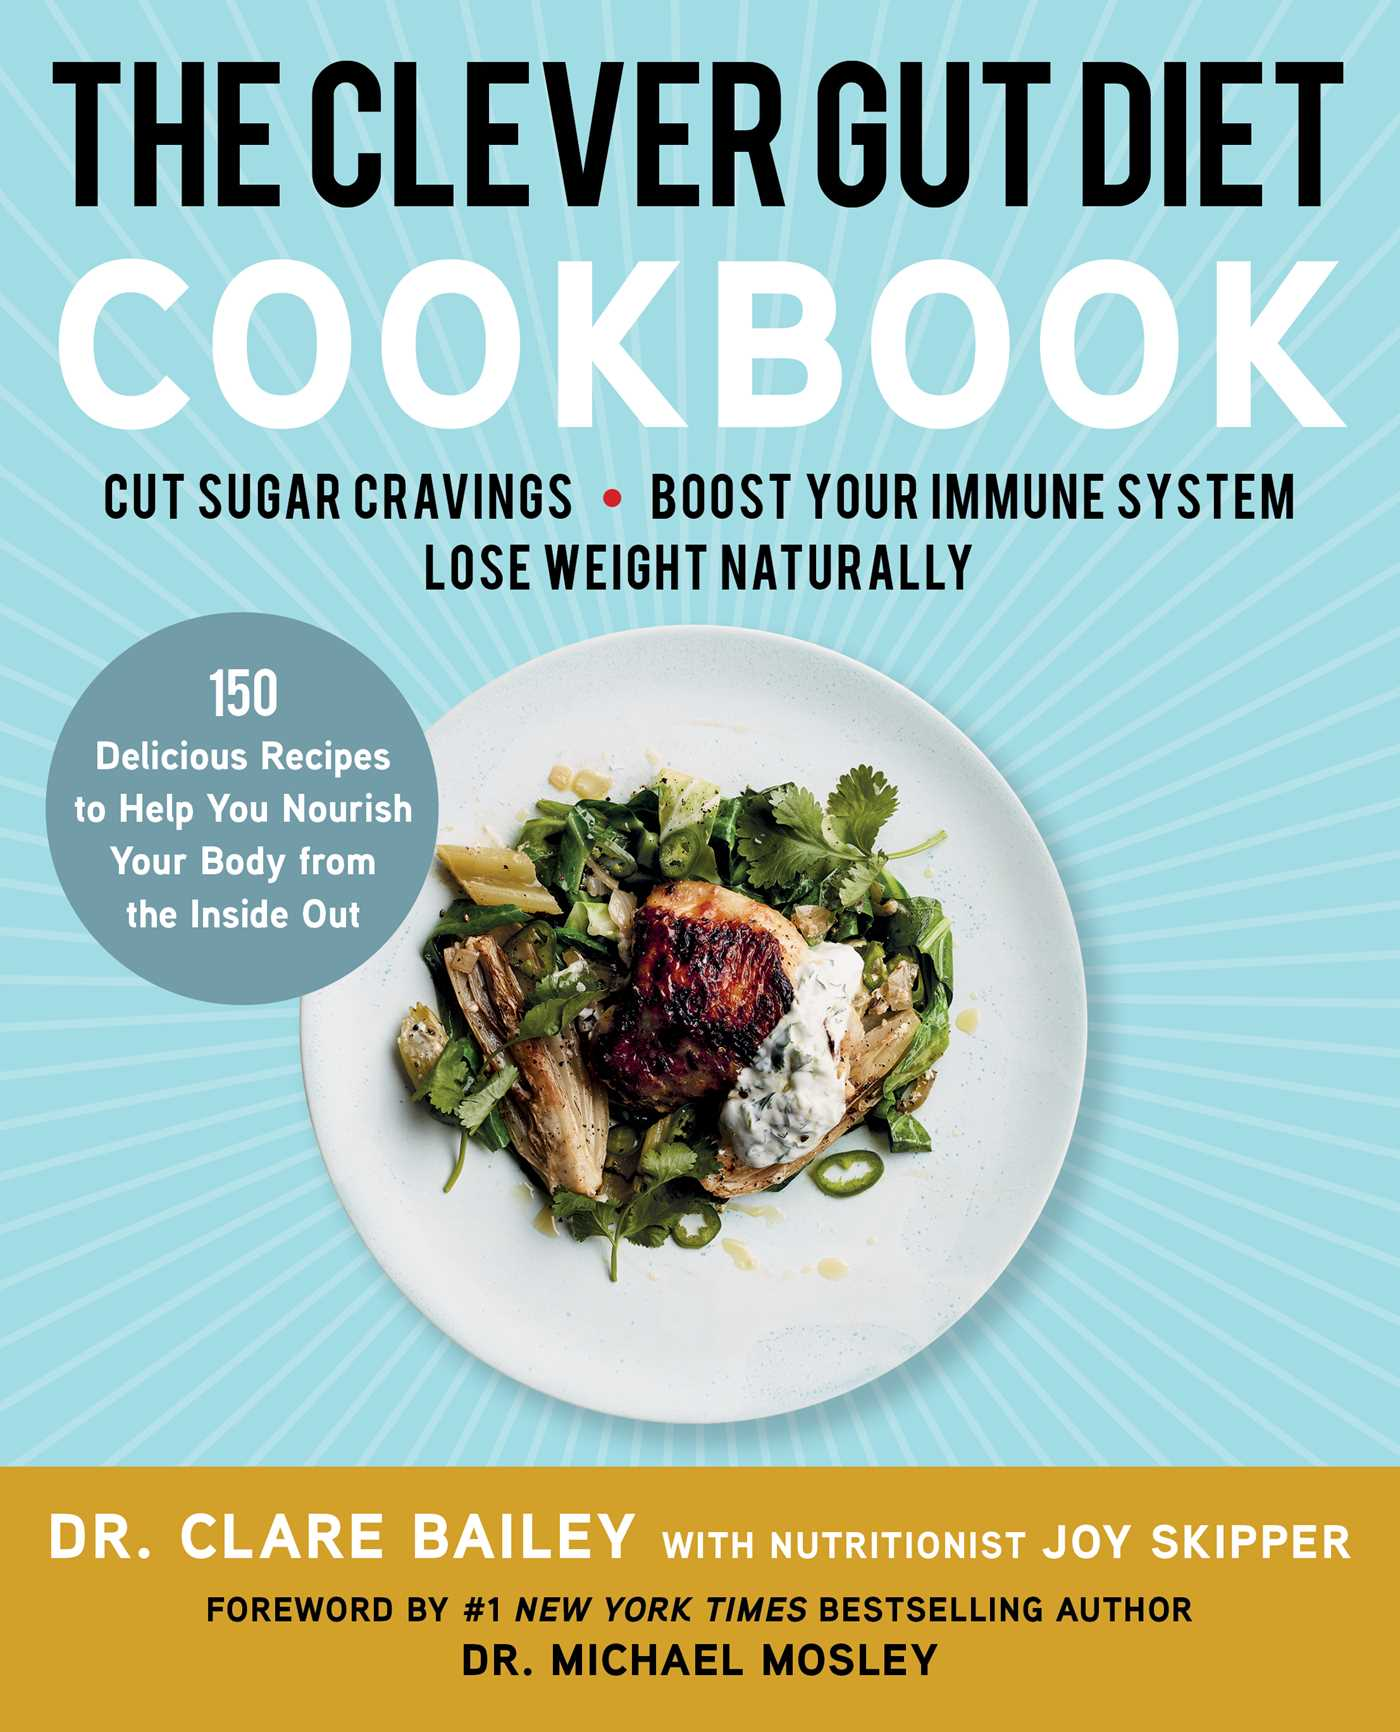 The clever gut diet cookbook 9781501189760 hr